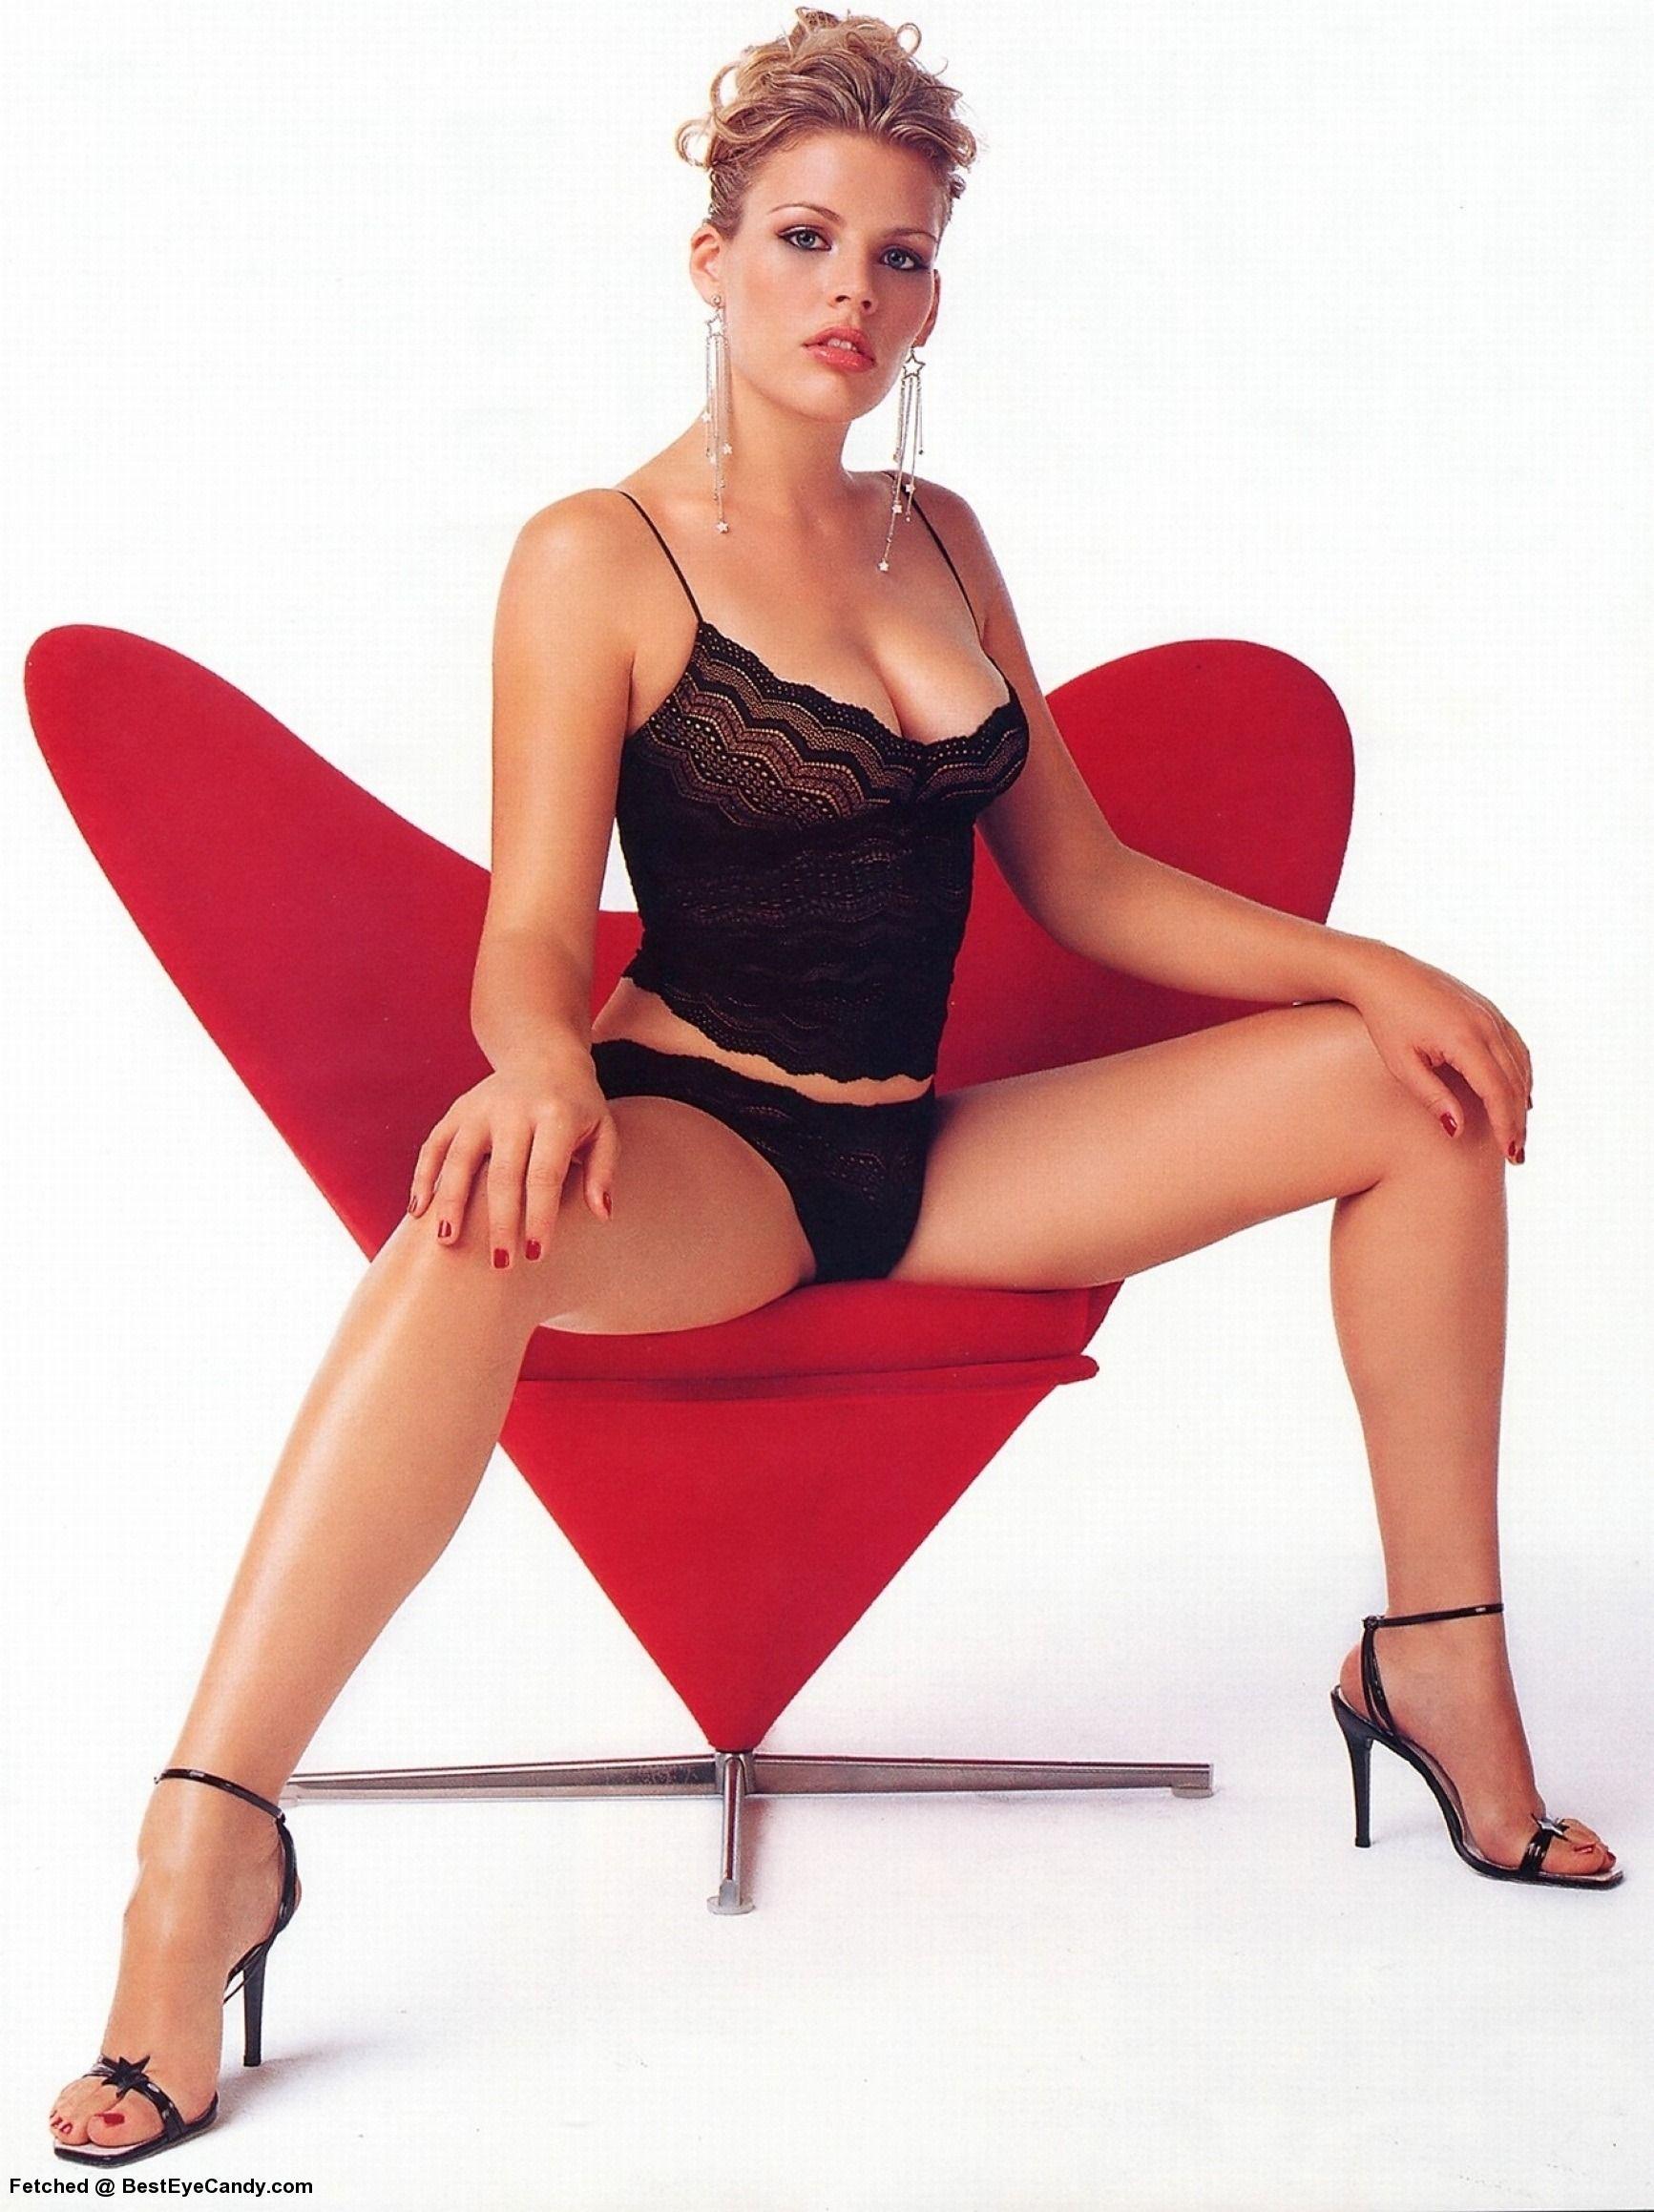 Bijou Phillips   Hot Chicks   Pinterest